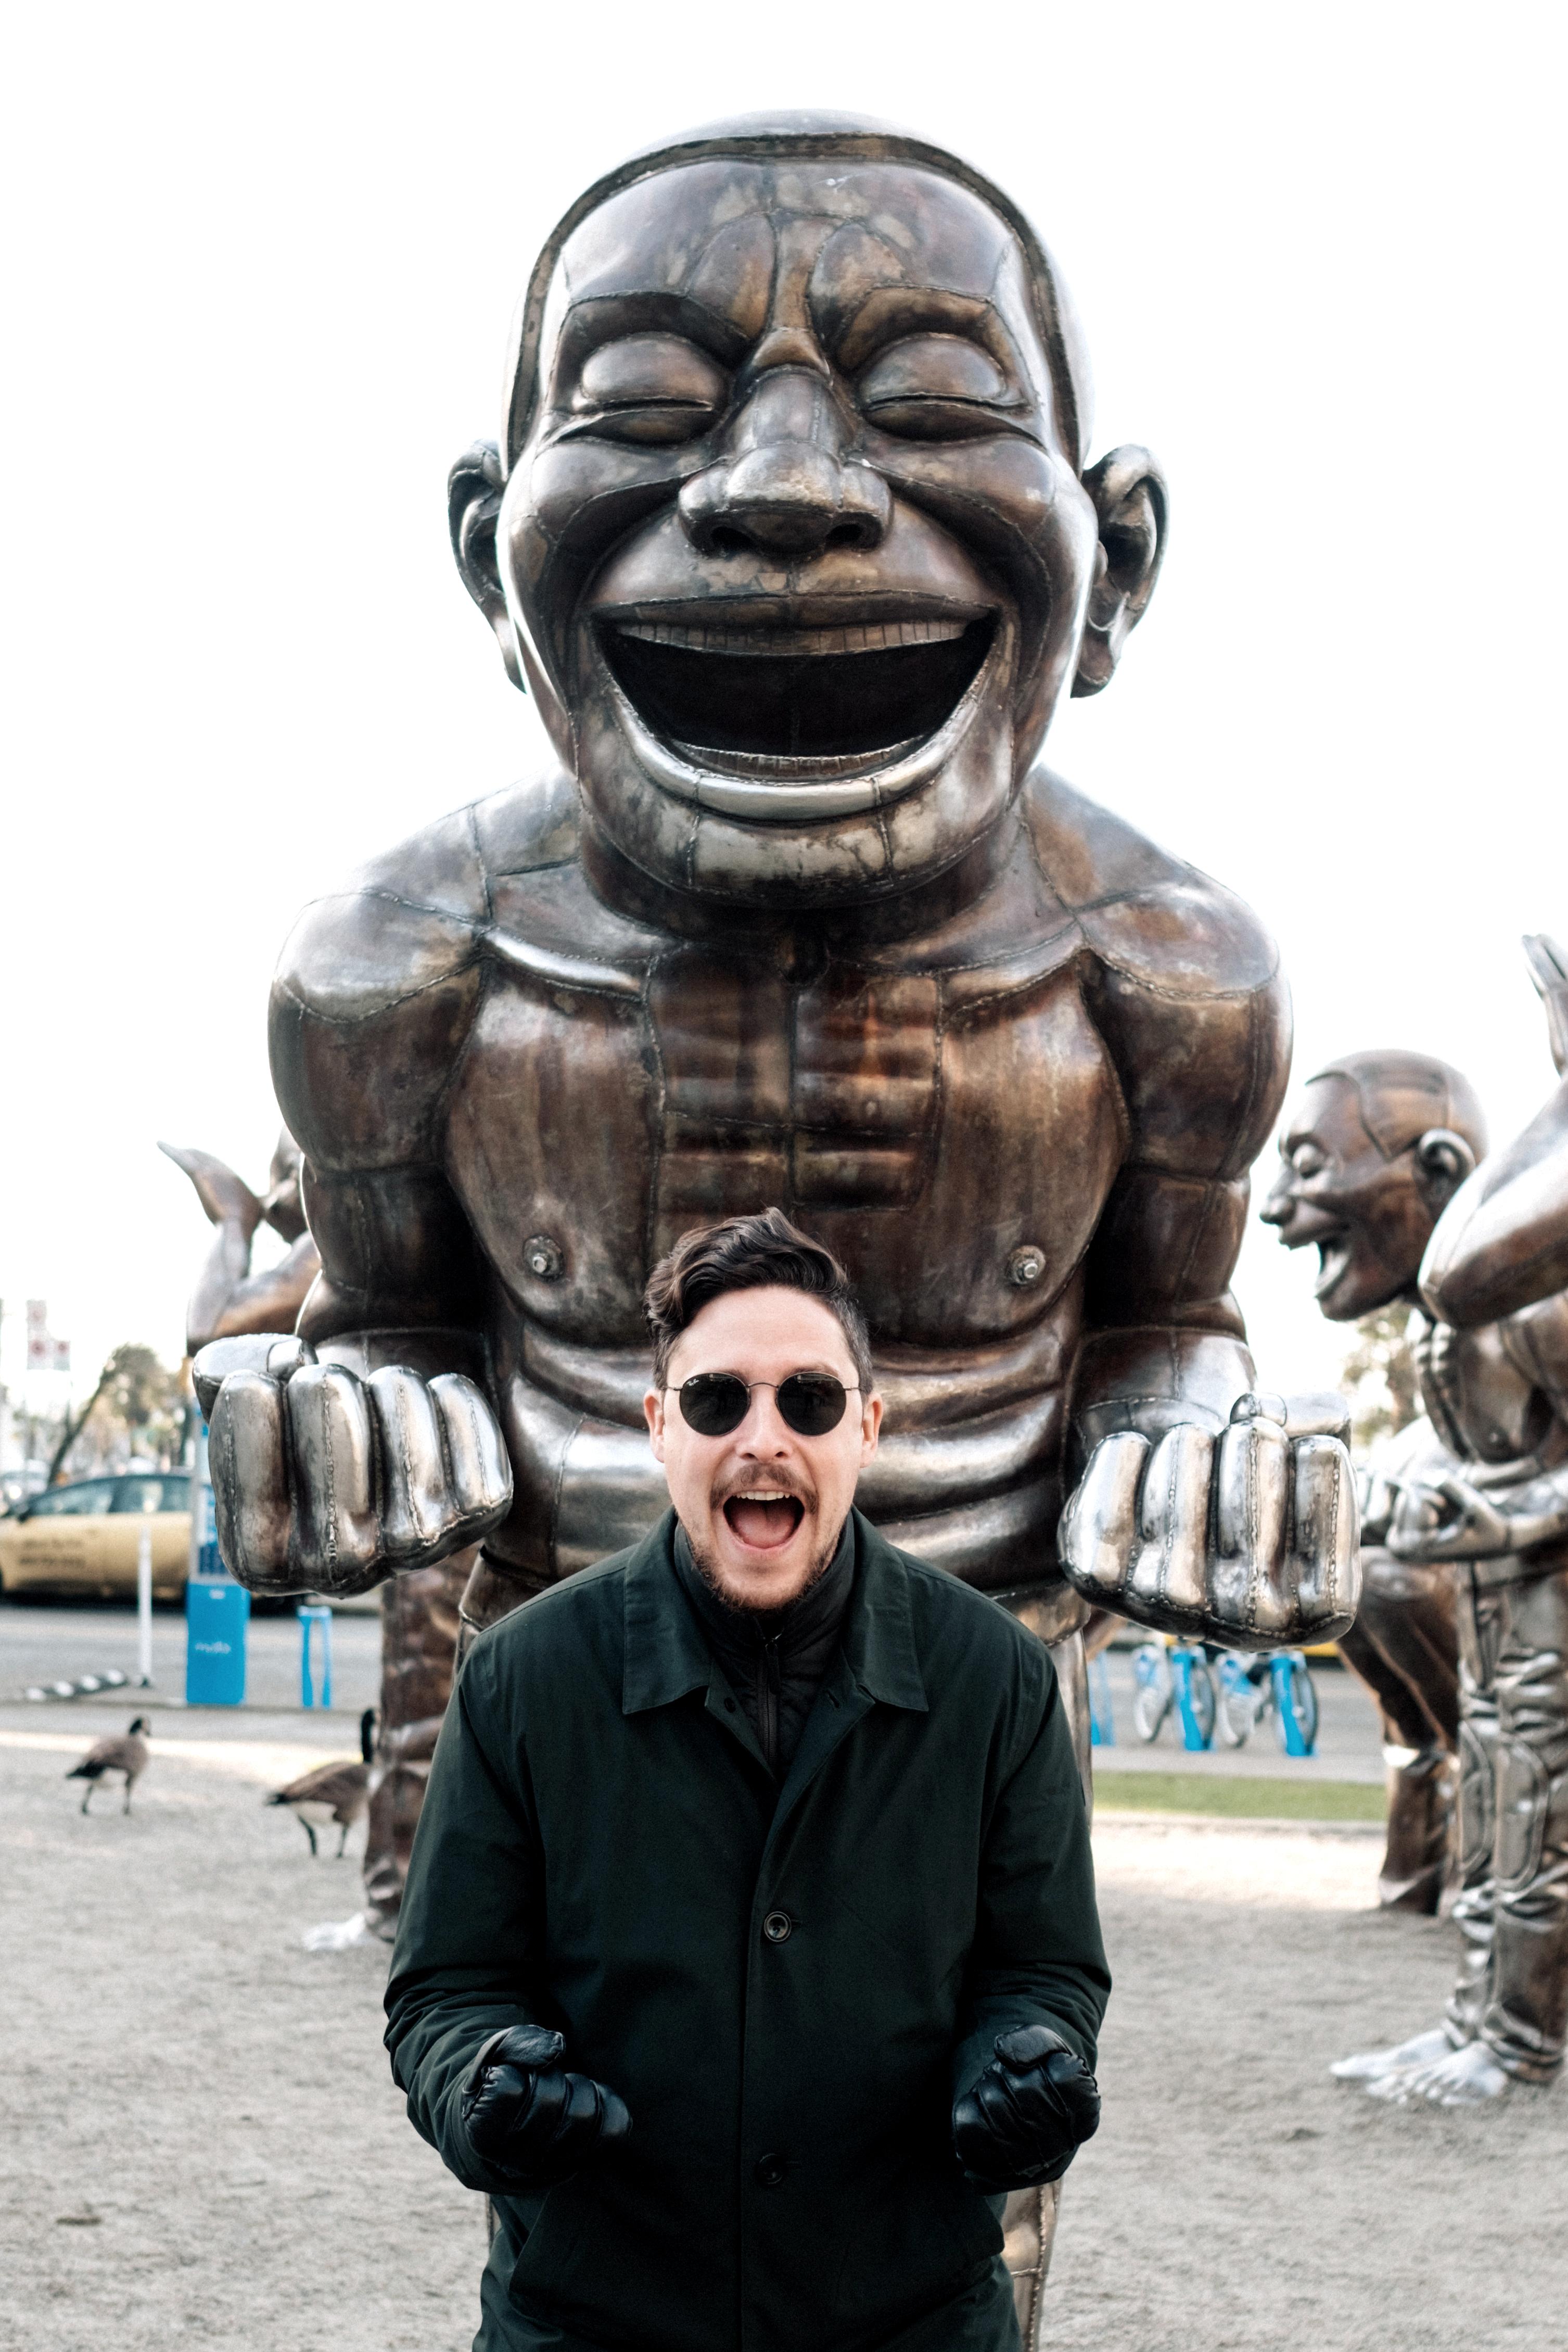 A-maze-ing Laughter pose